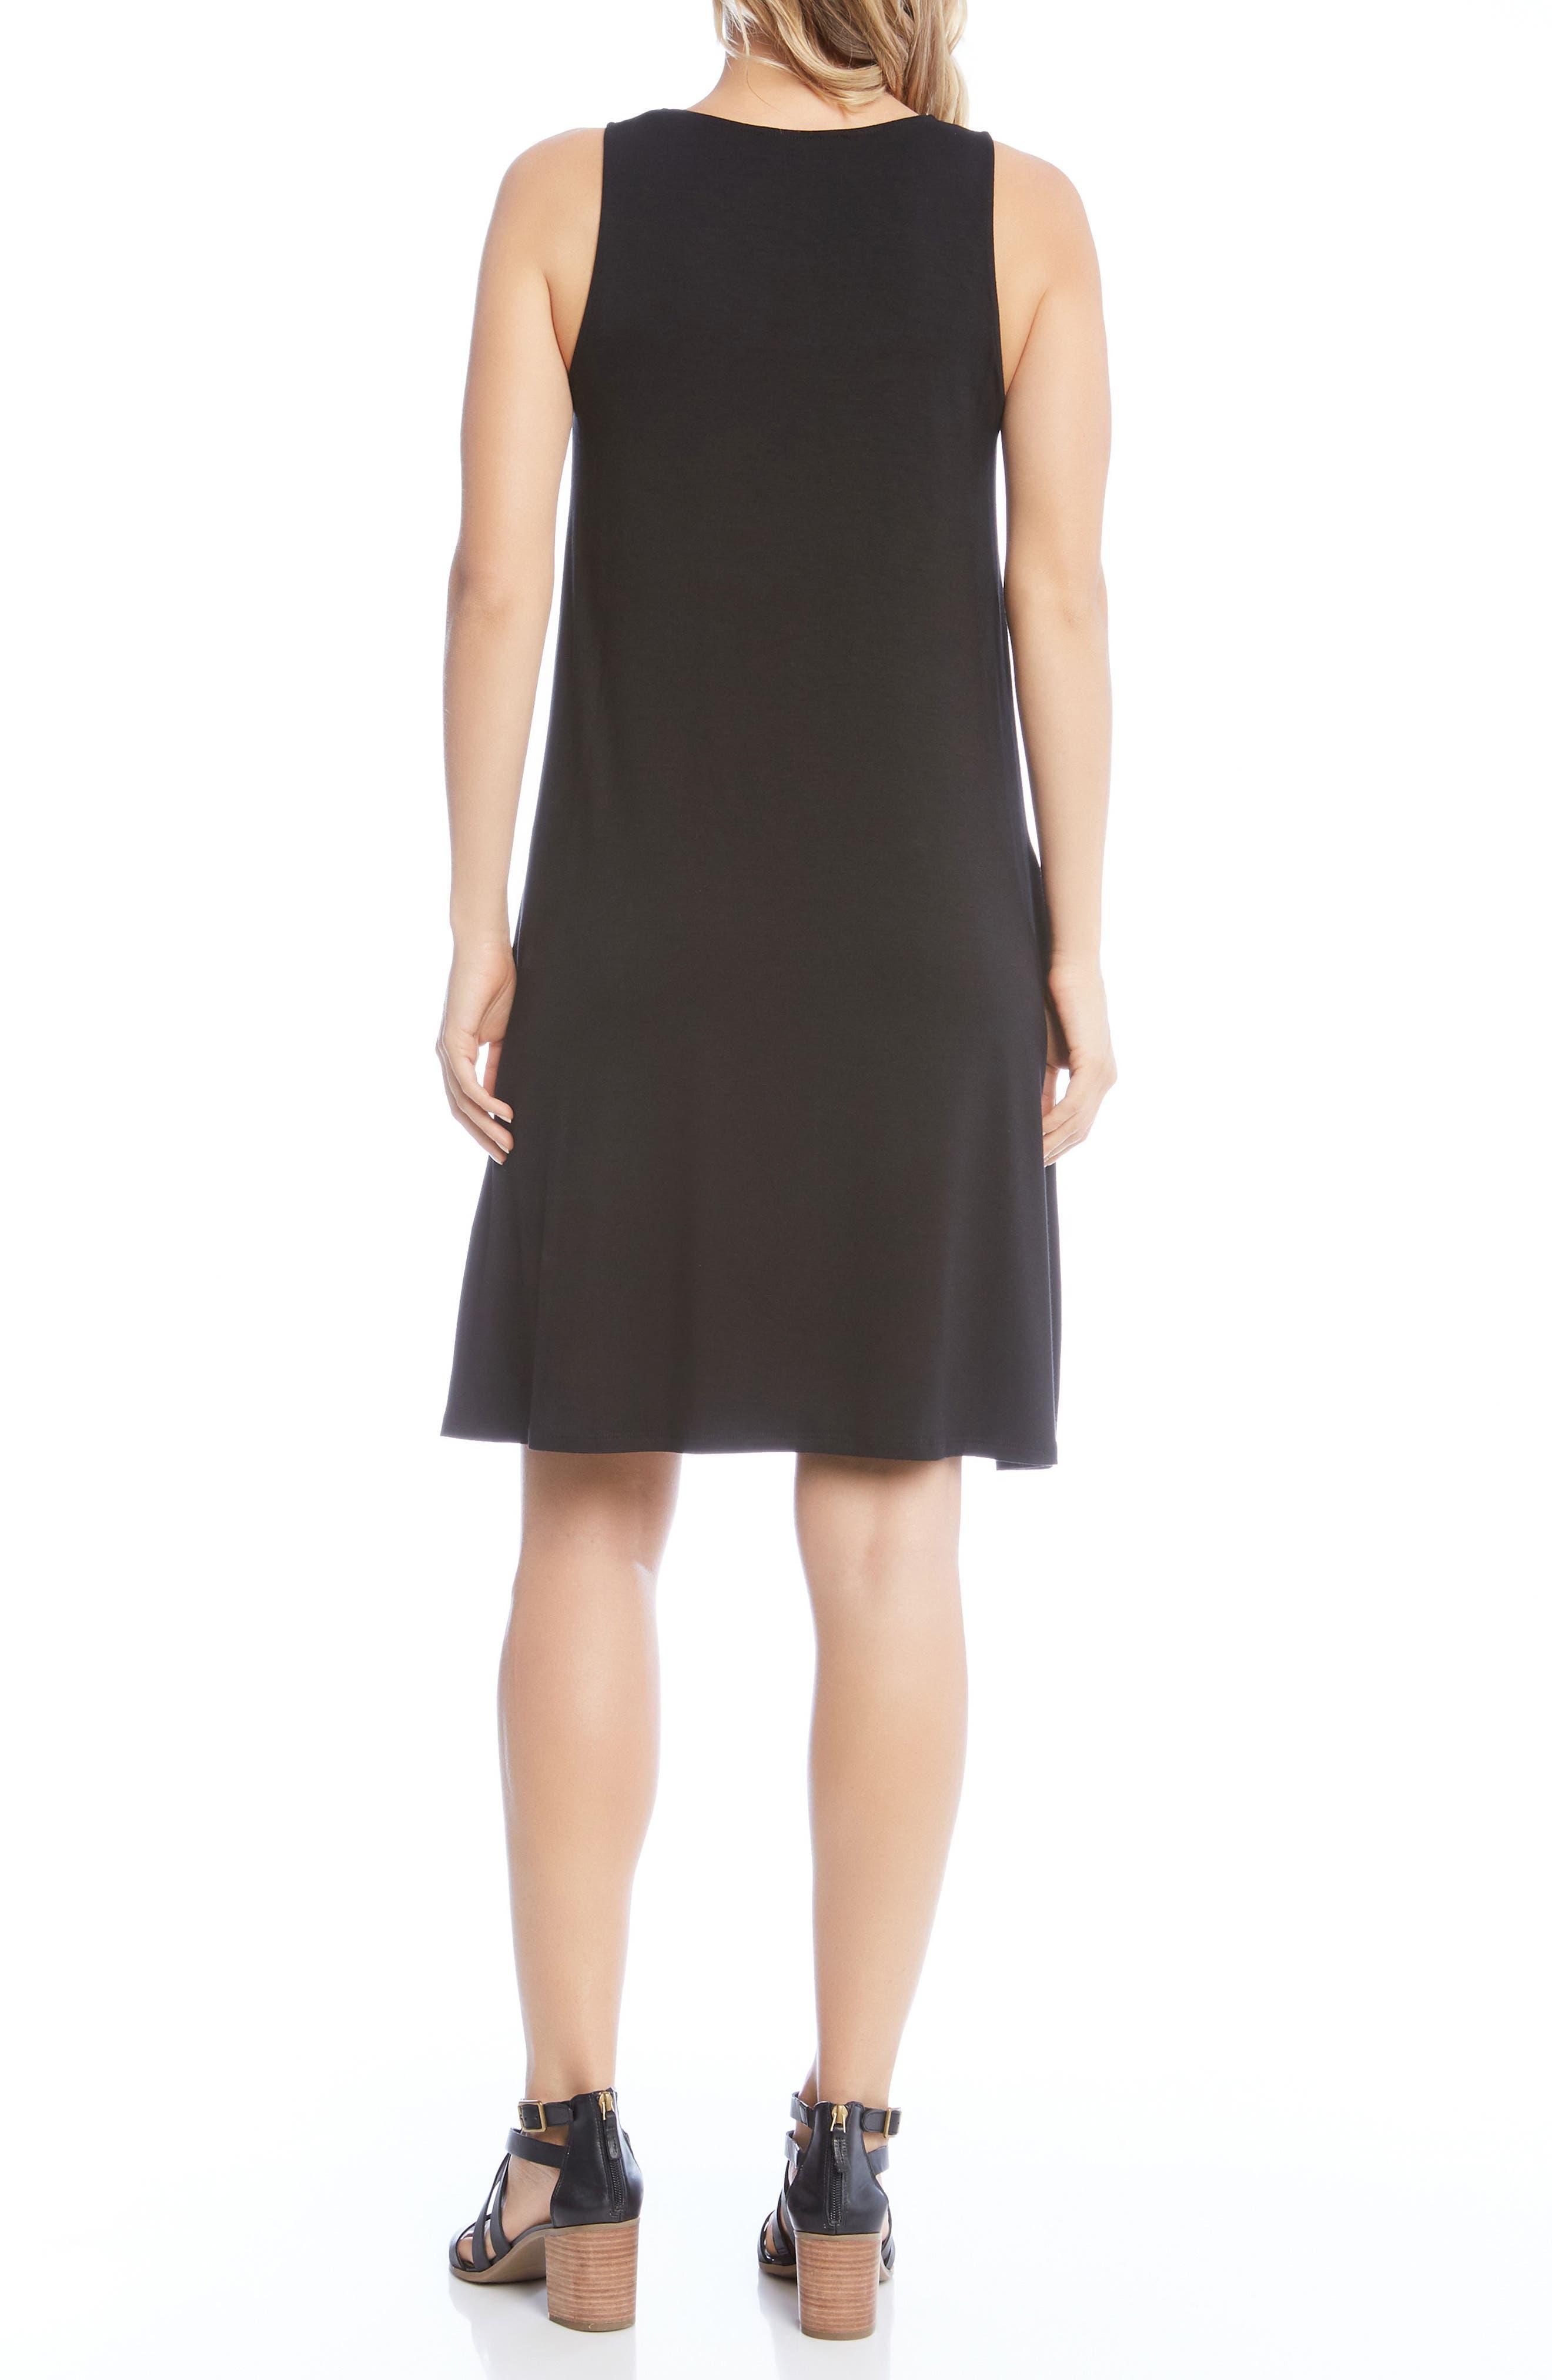 Chloe Swing Jersey Dress,                             Alternate thumbnail 2, color,                             001